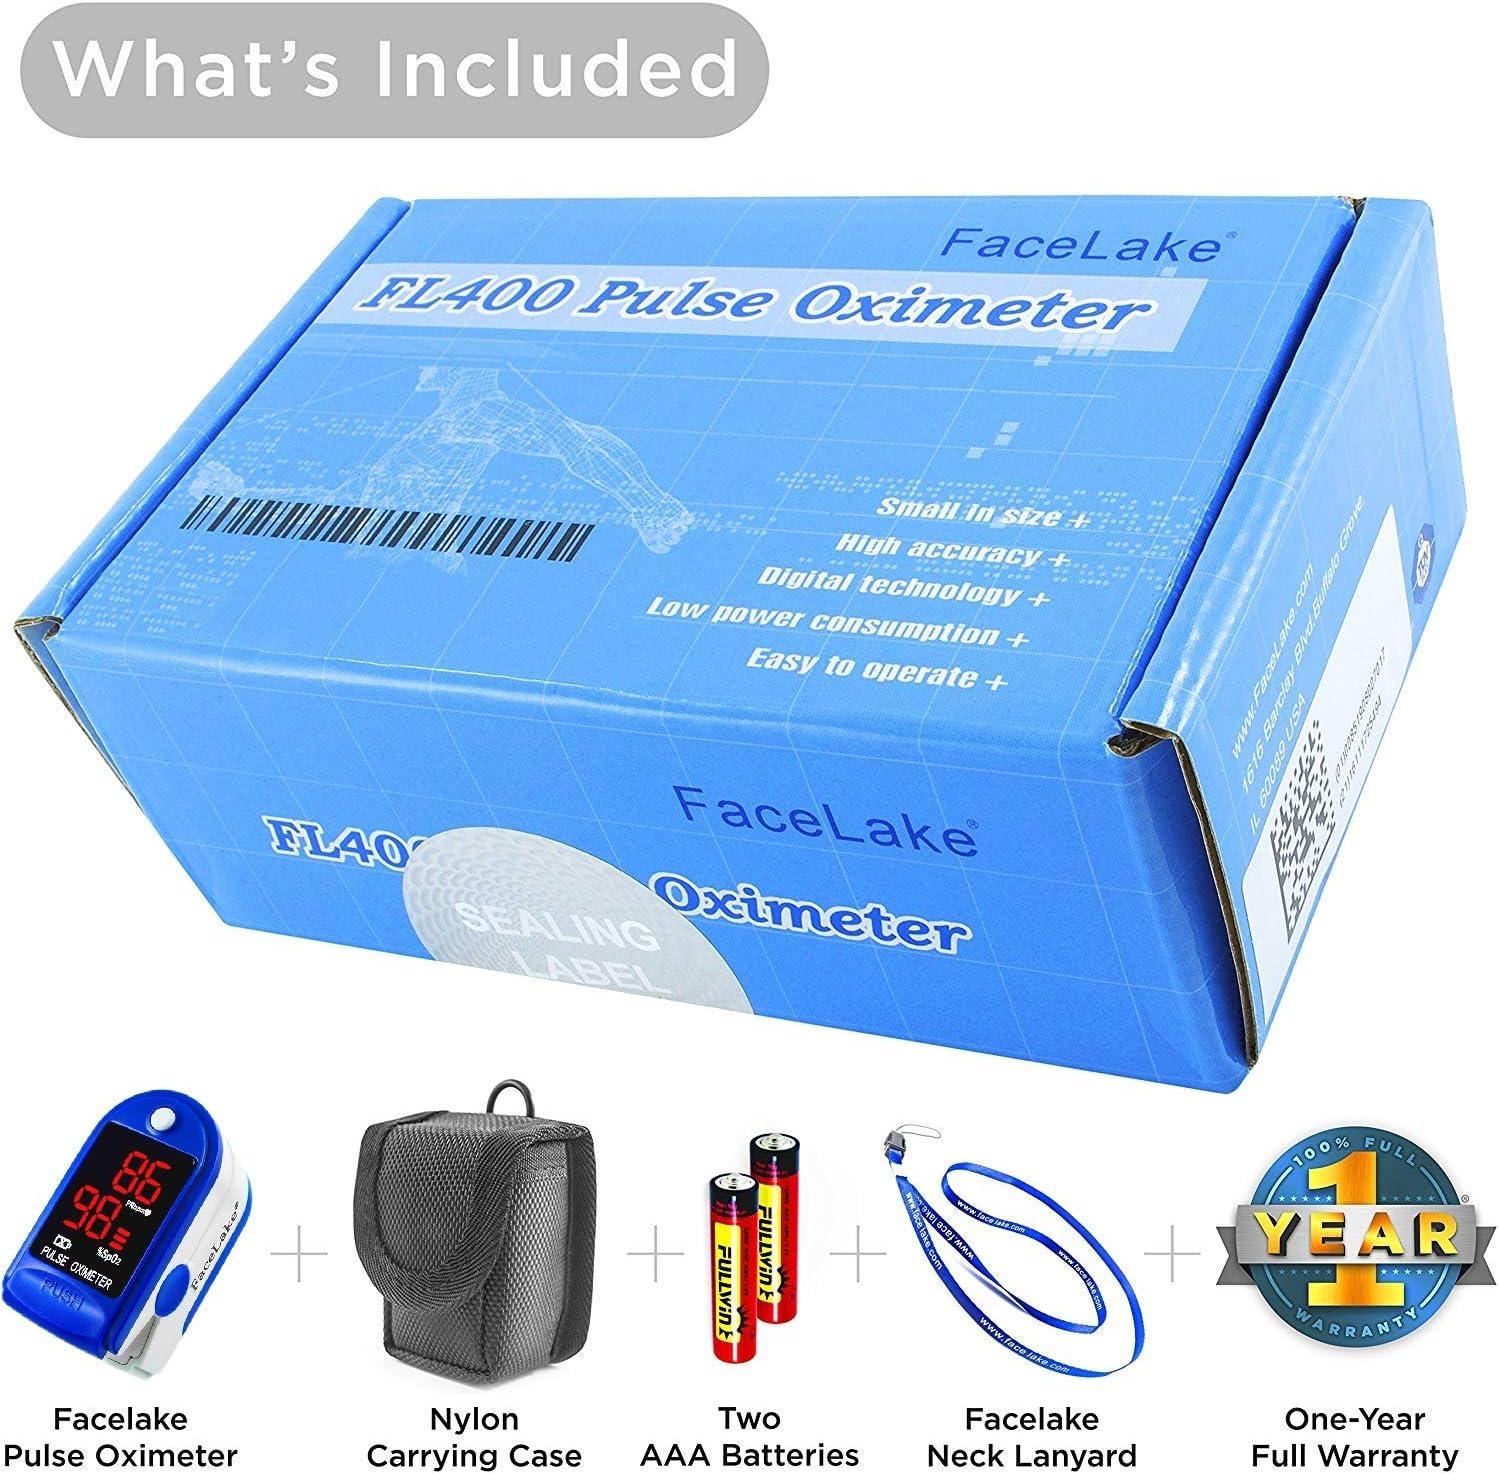 FaceLake ® FL400 Pulse Oximeter Fingertip with Carrying Case, Batteries, Lanyard, and Warranty (Blue)